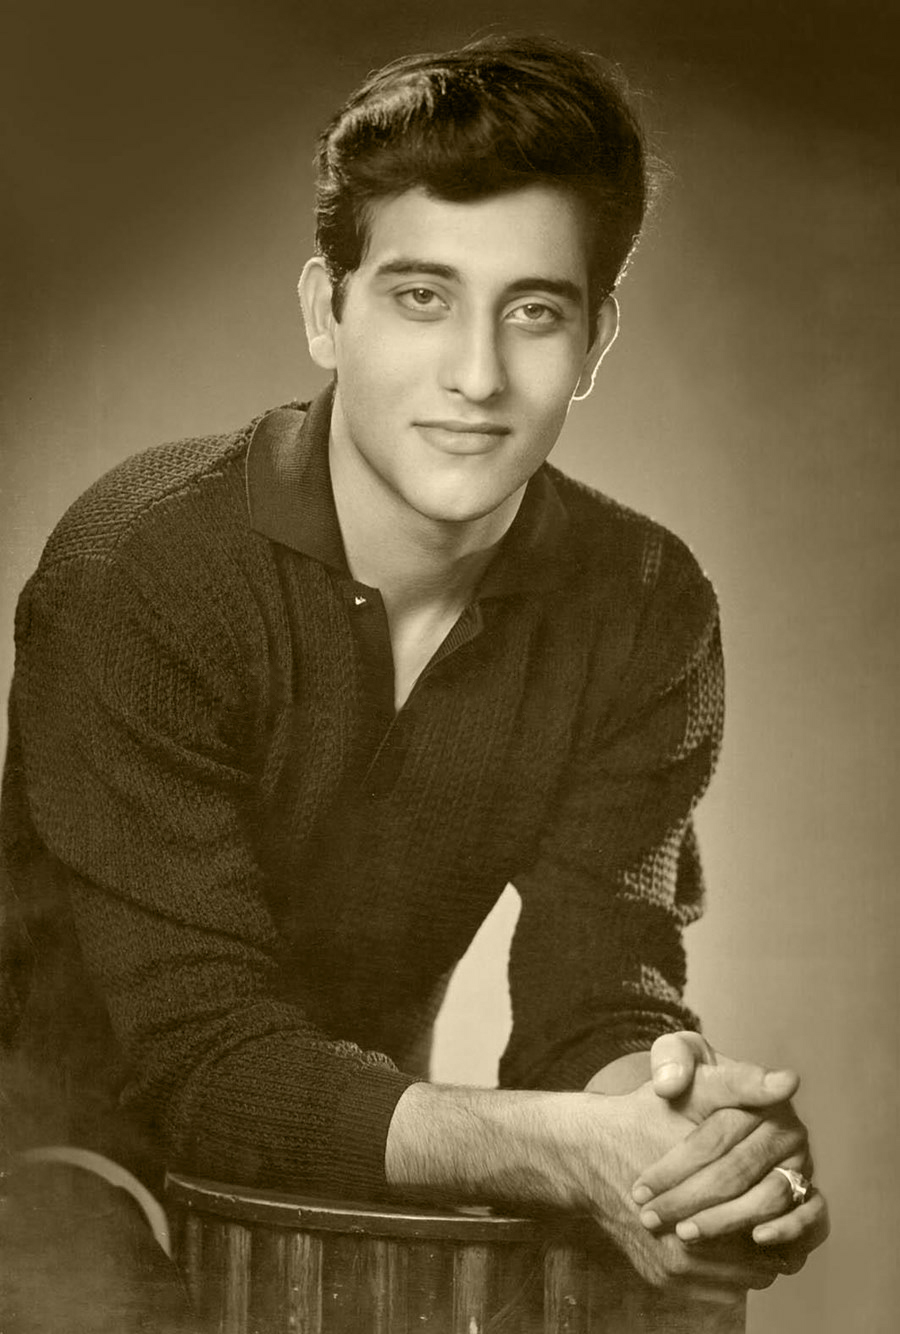 Portrait of Indian Hindi Movie Actor Vinod Khanna